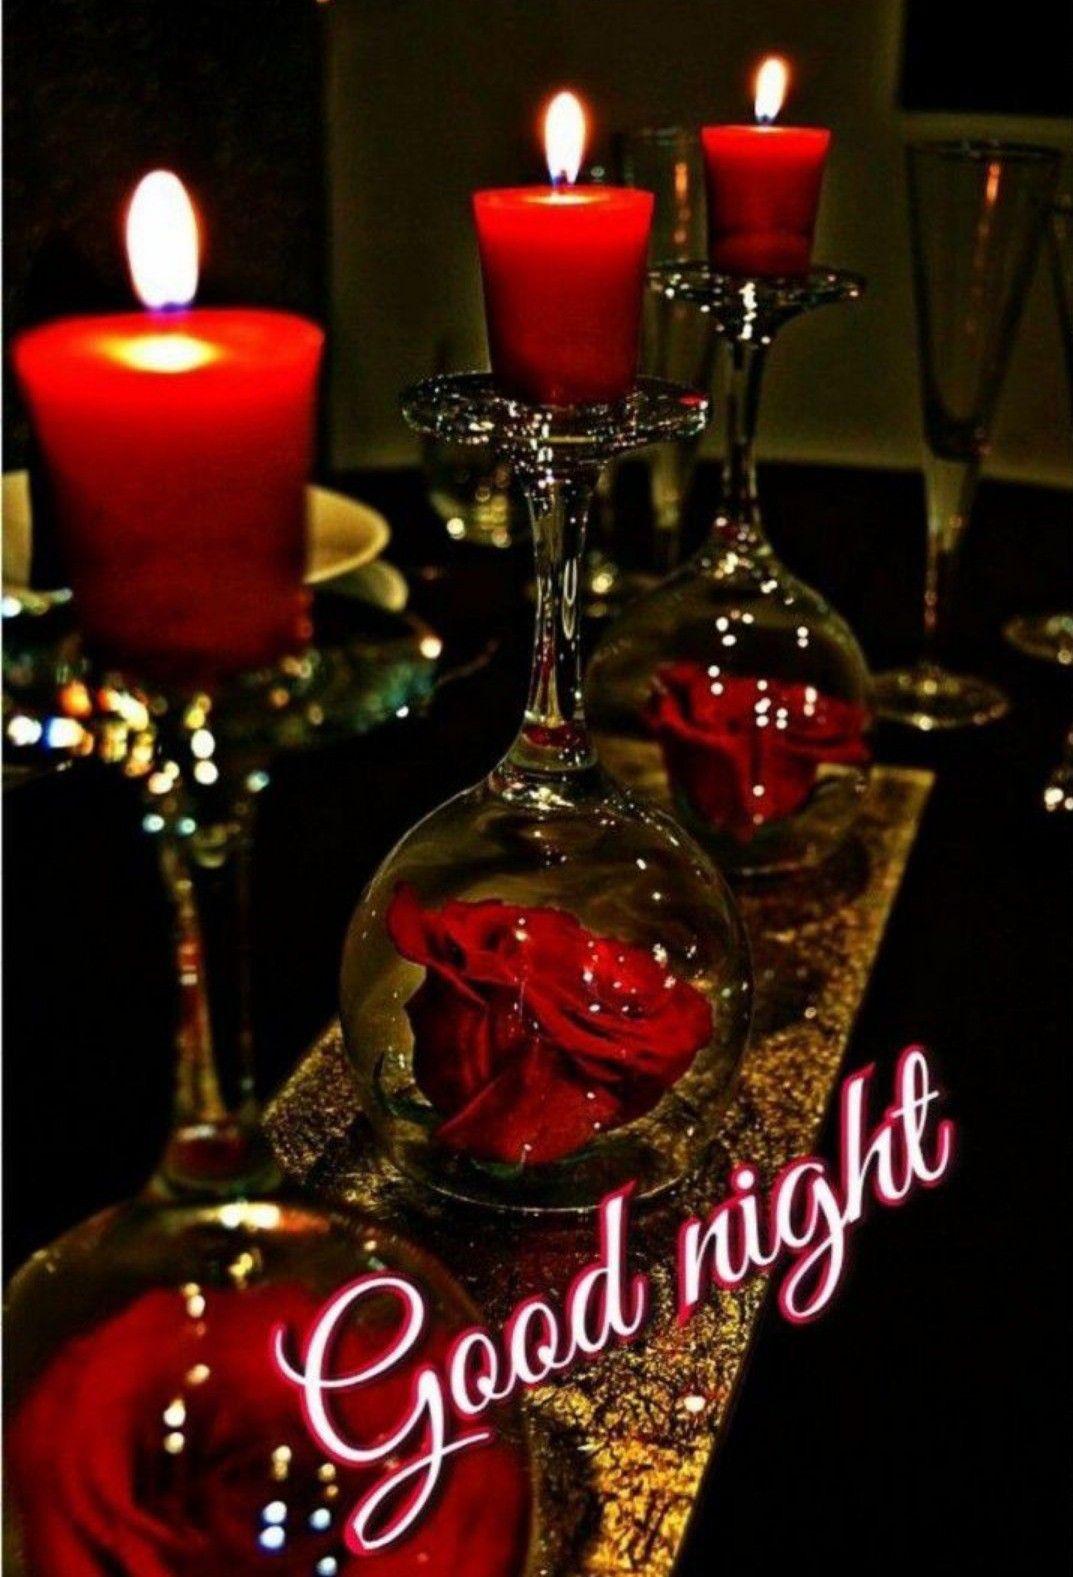 Pin by punitha sam on good morning u good night pinterest night